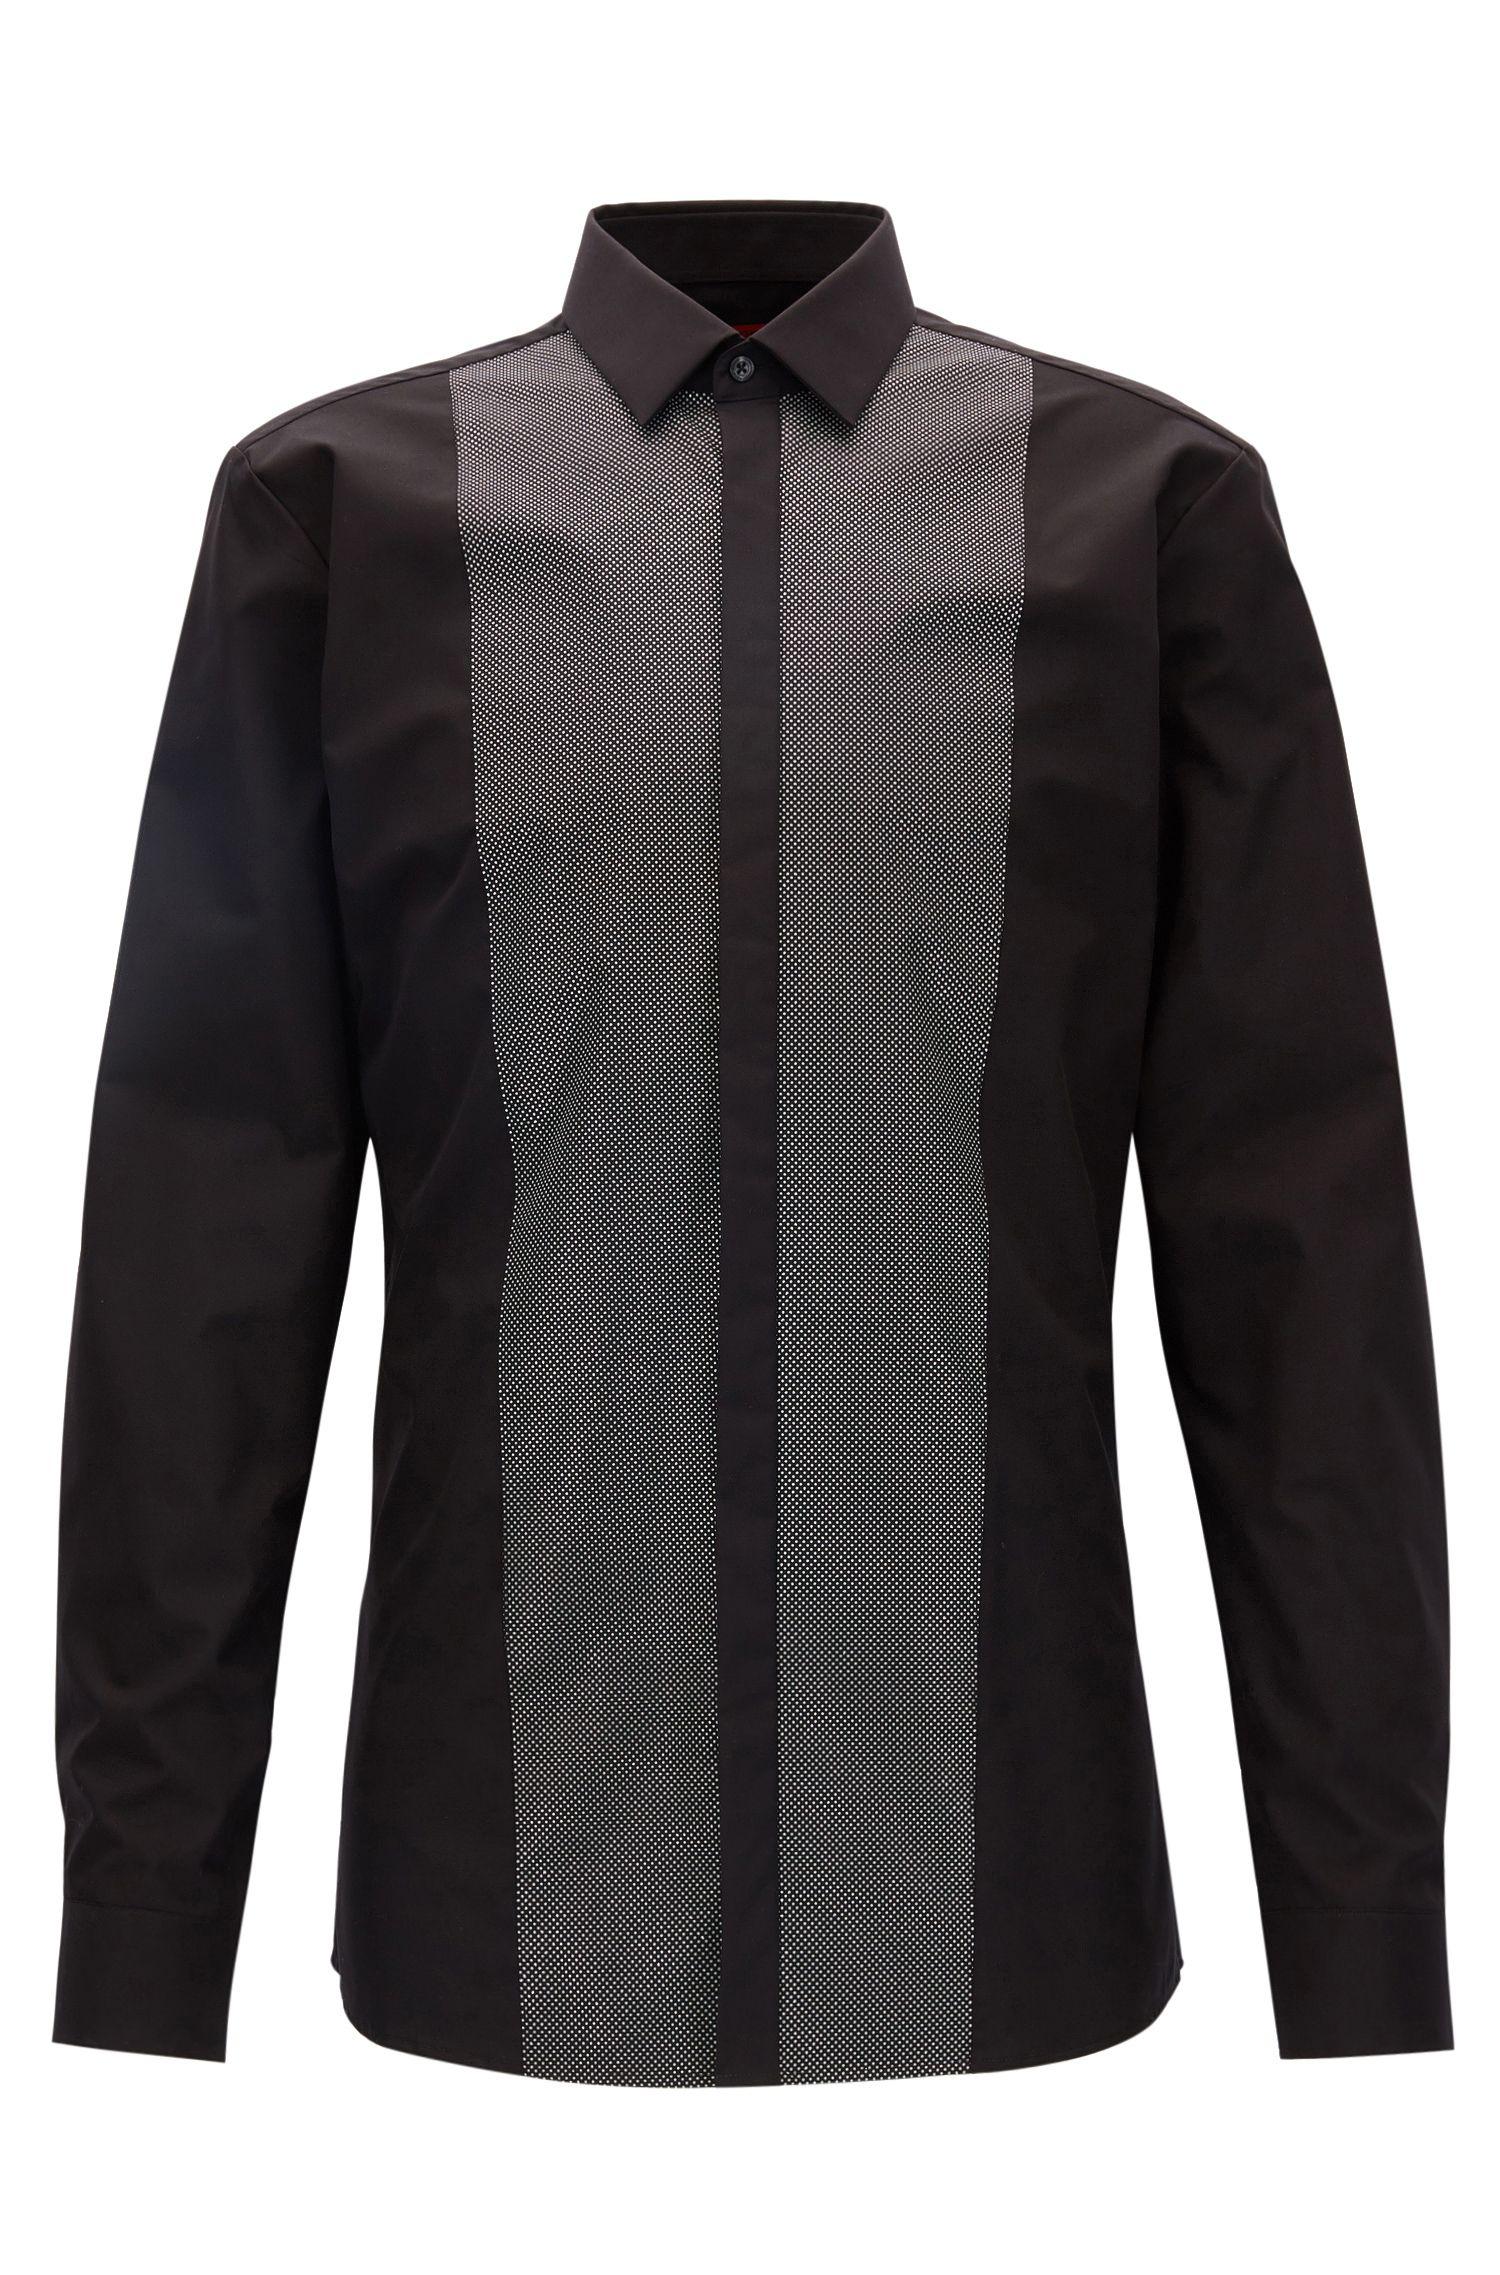 Metallic Print Easy Iron Dress Shirt, Extra-Slim Fit | Easto, Black